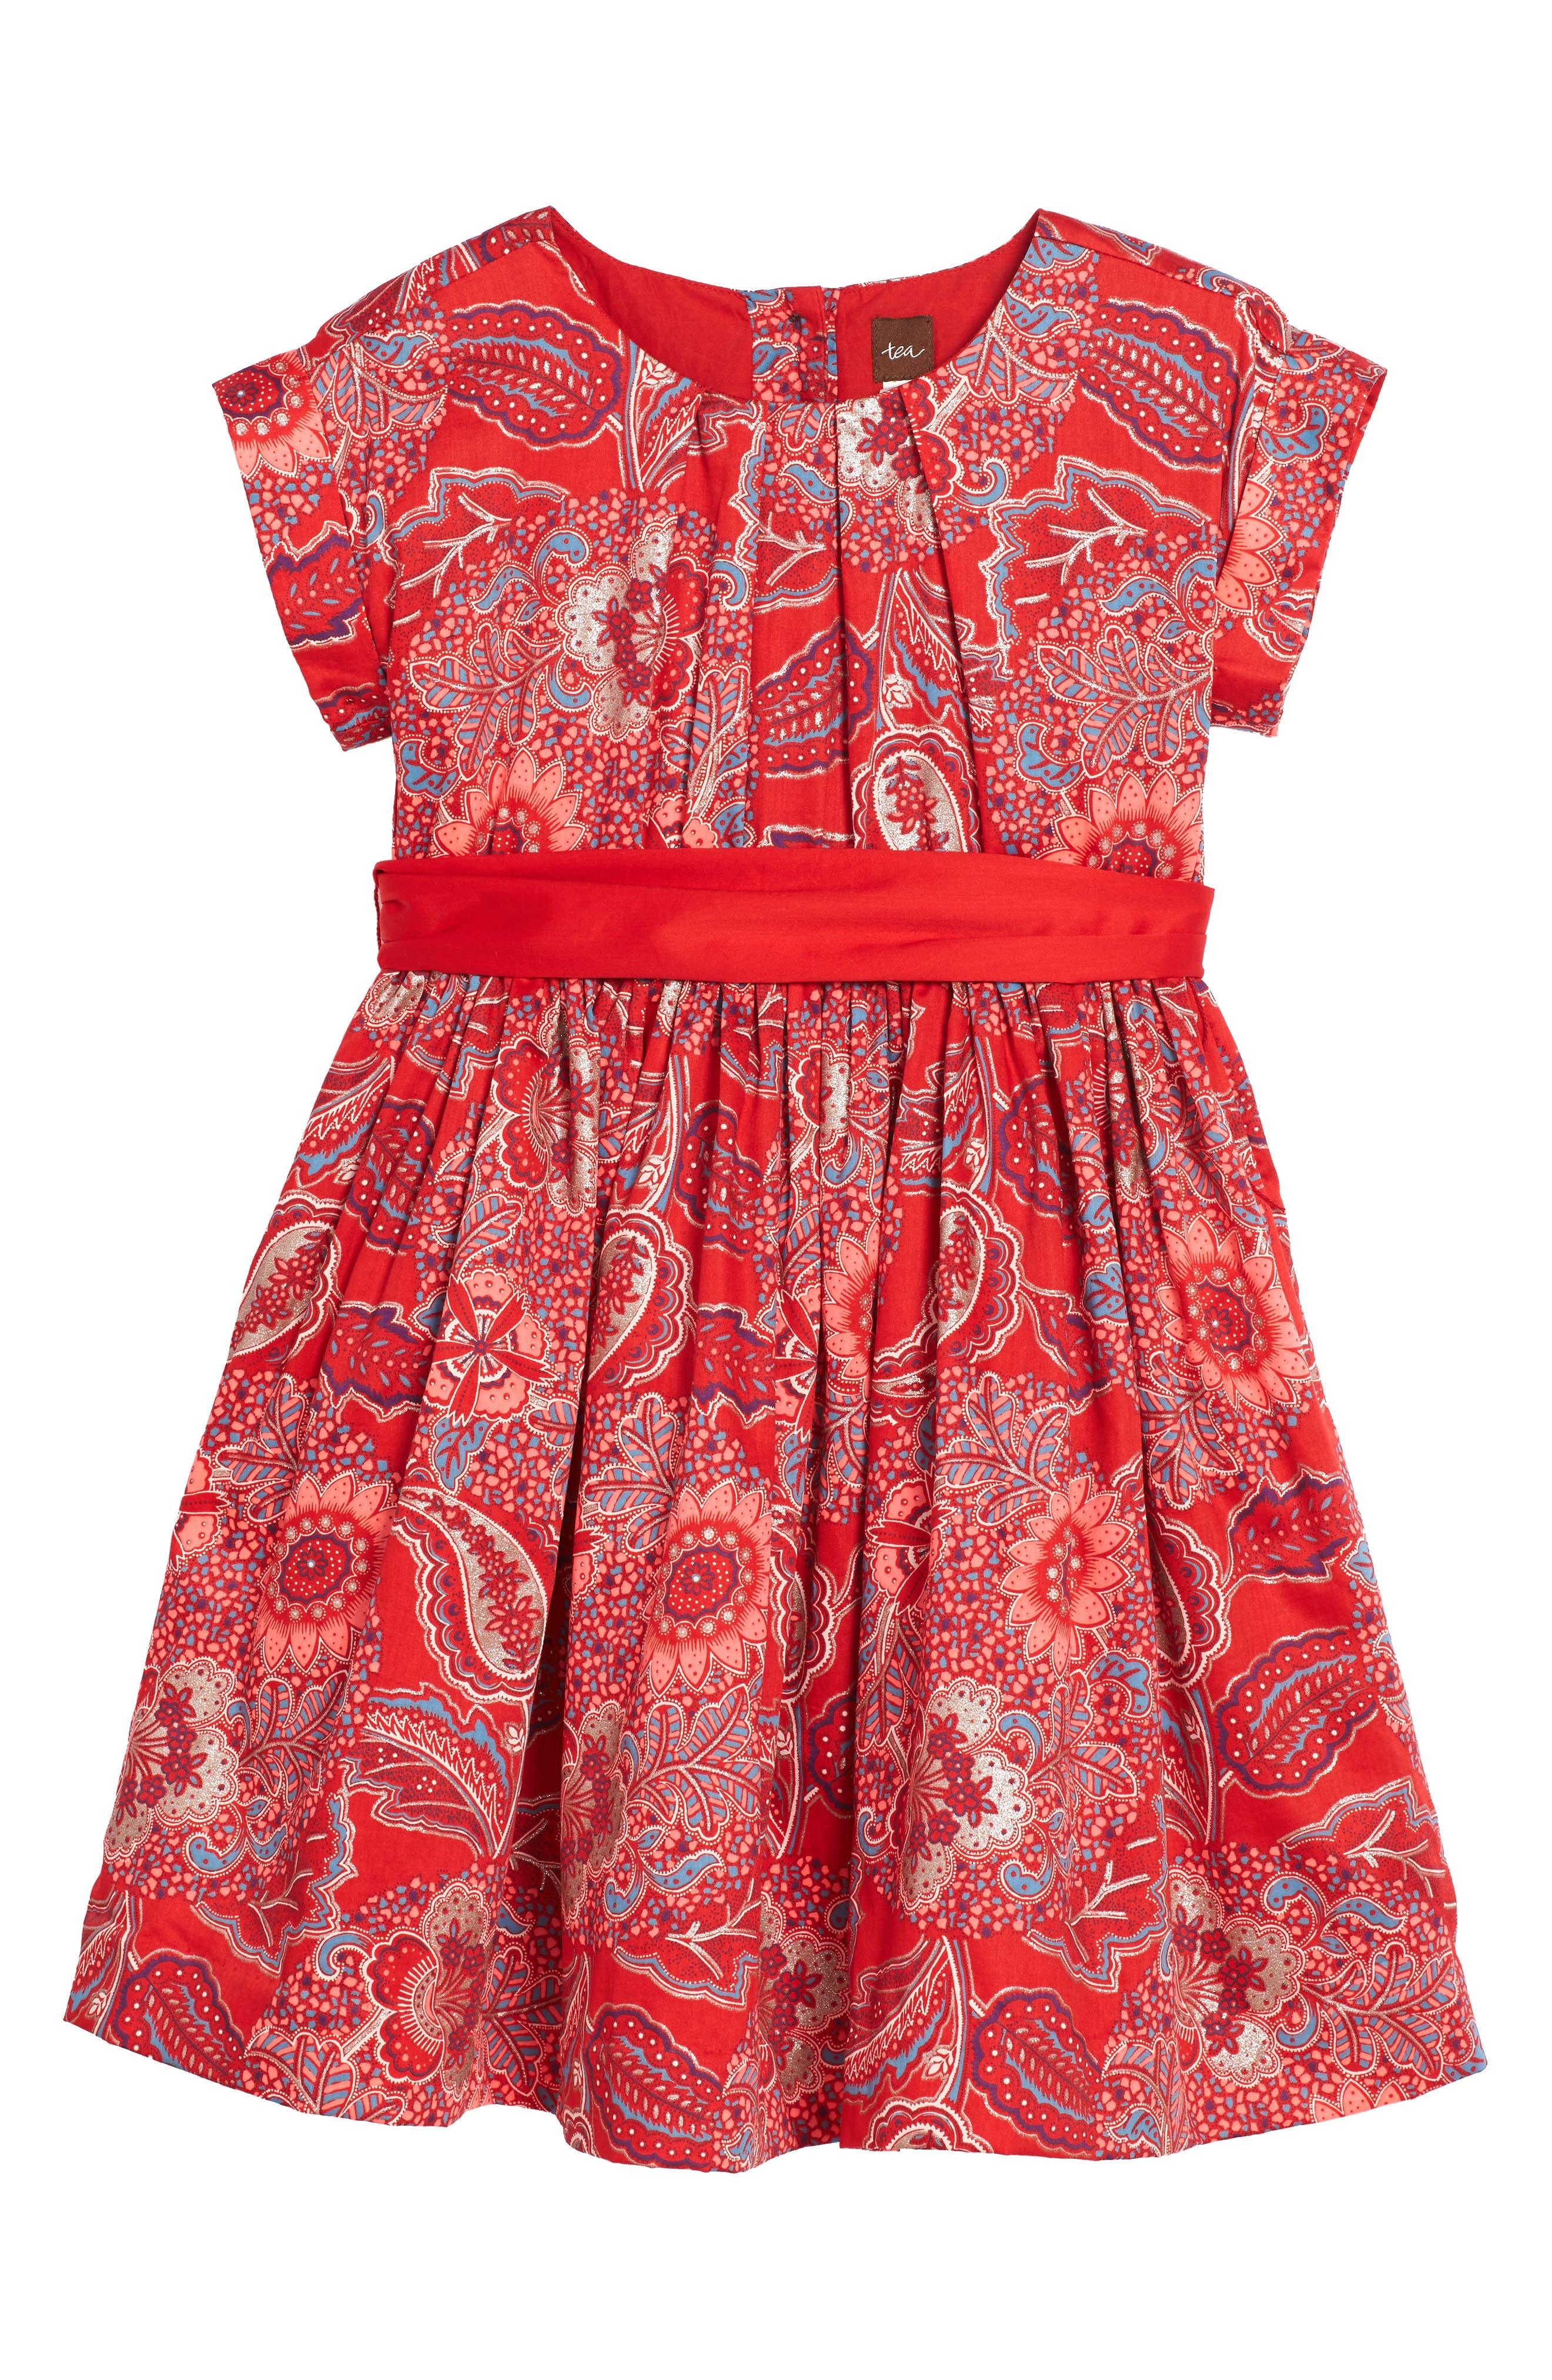 Adaira Sash Dress,                             Main thumbnail 1, color,                             615